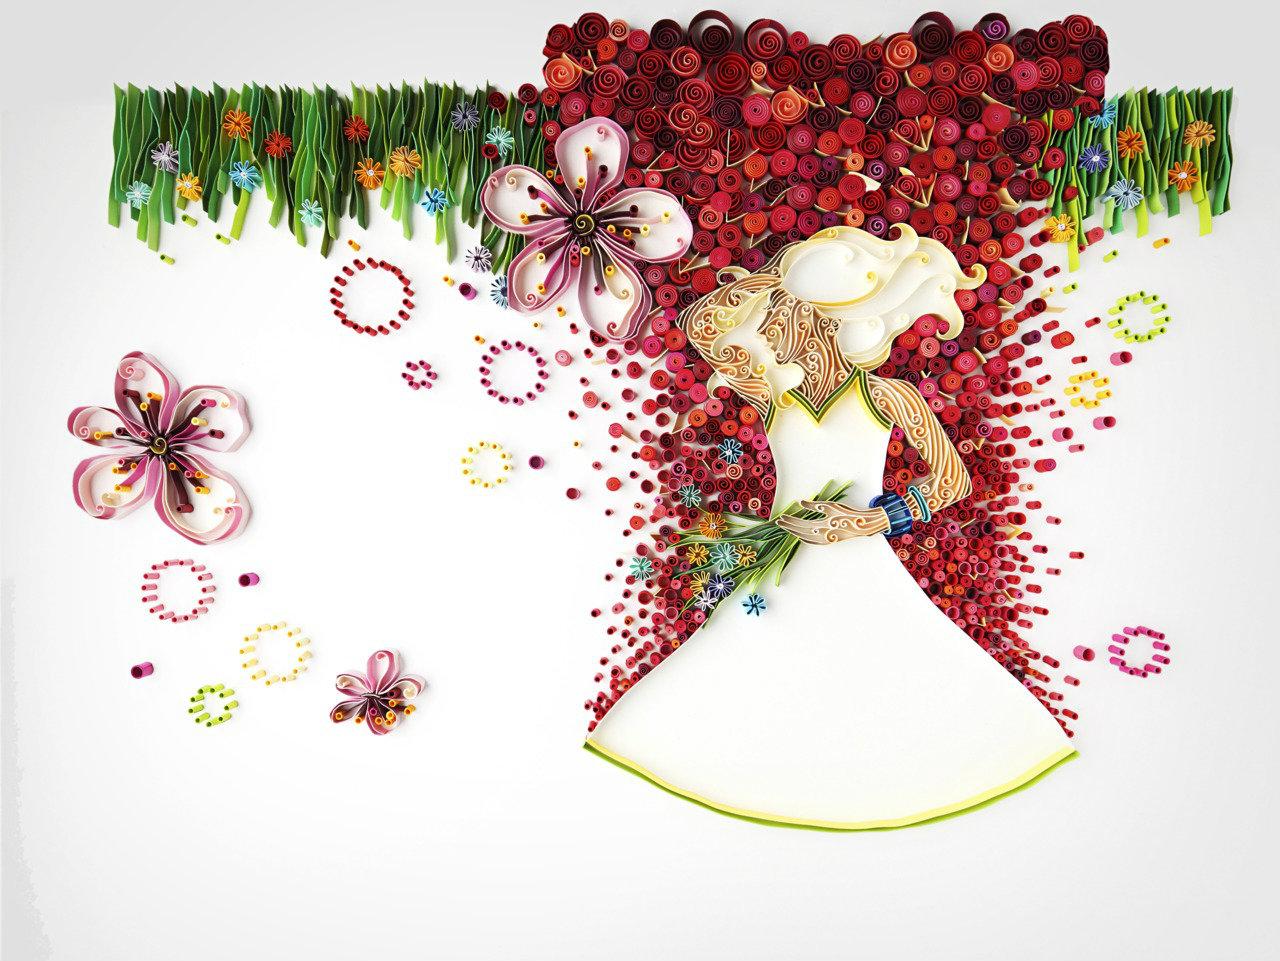 yulia-brodskaya-paper-quilling-11